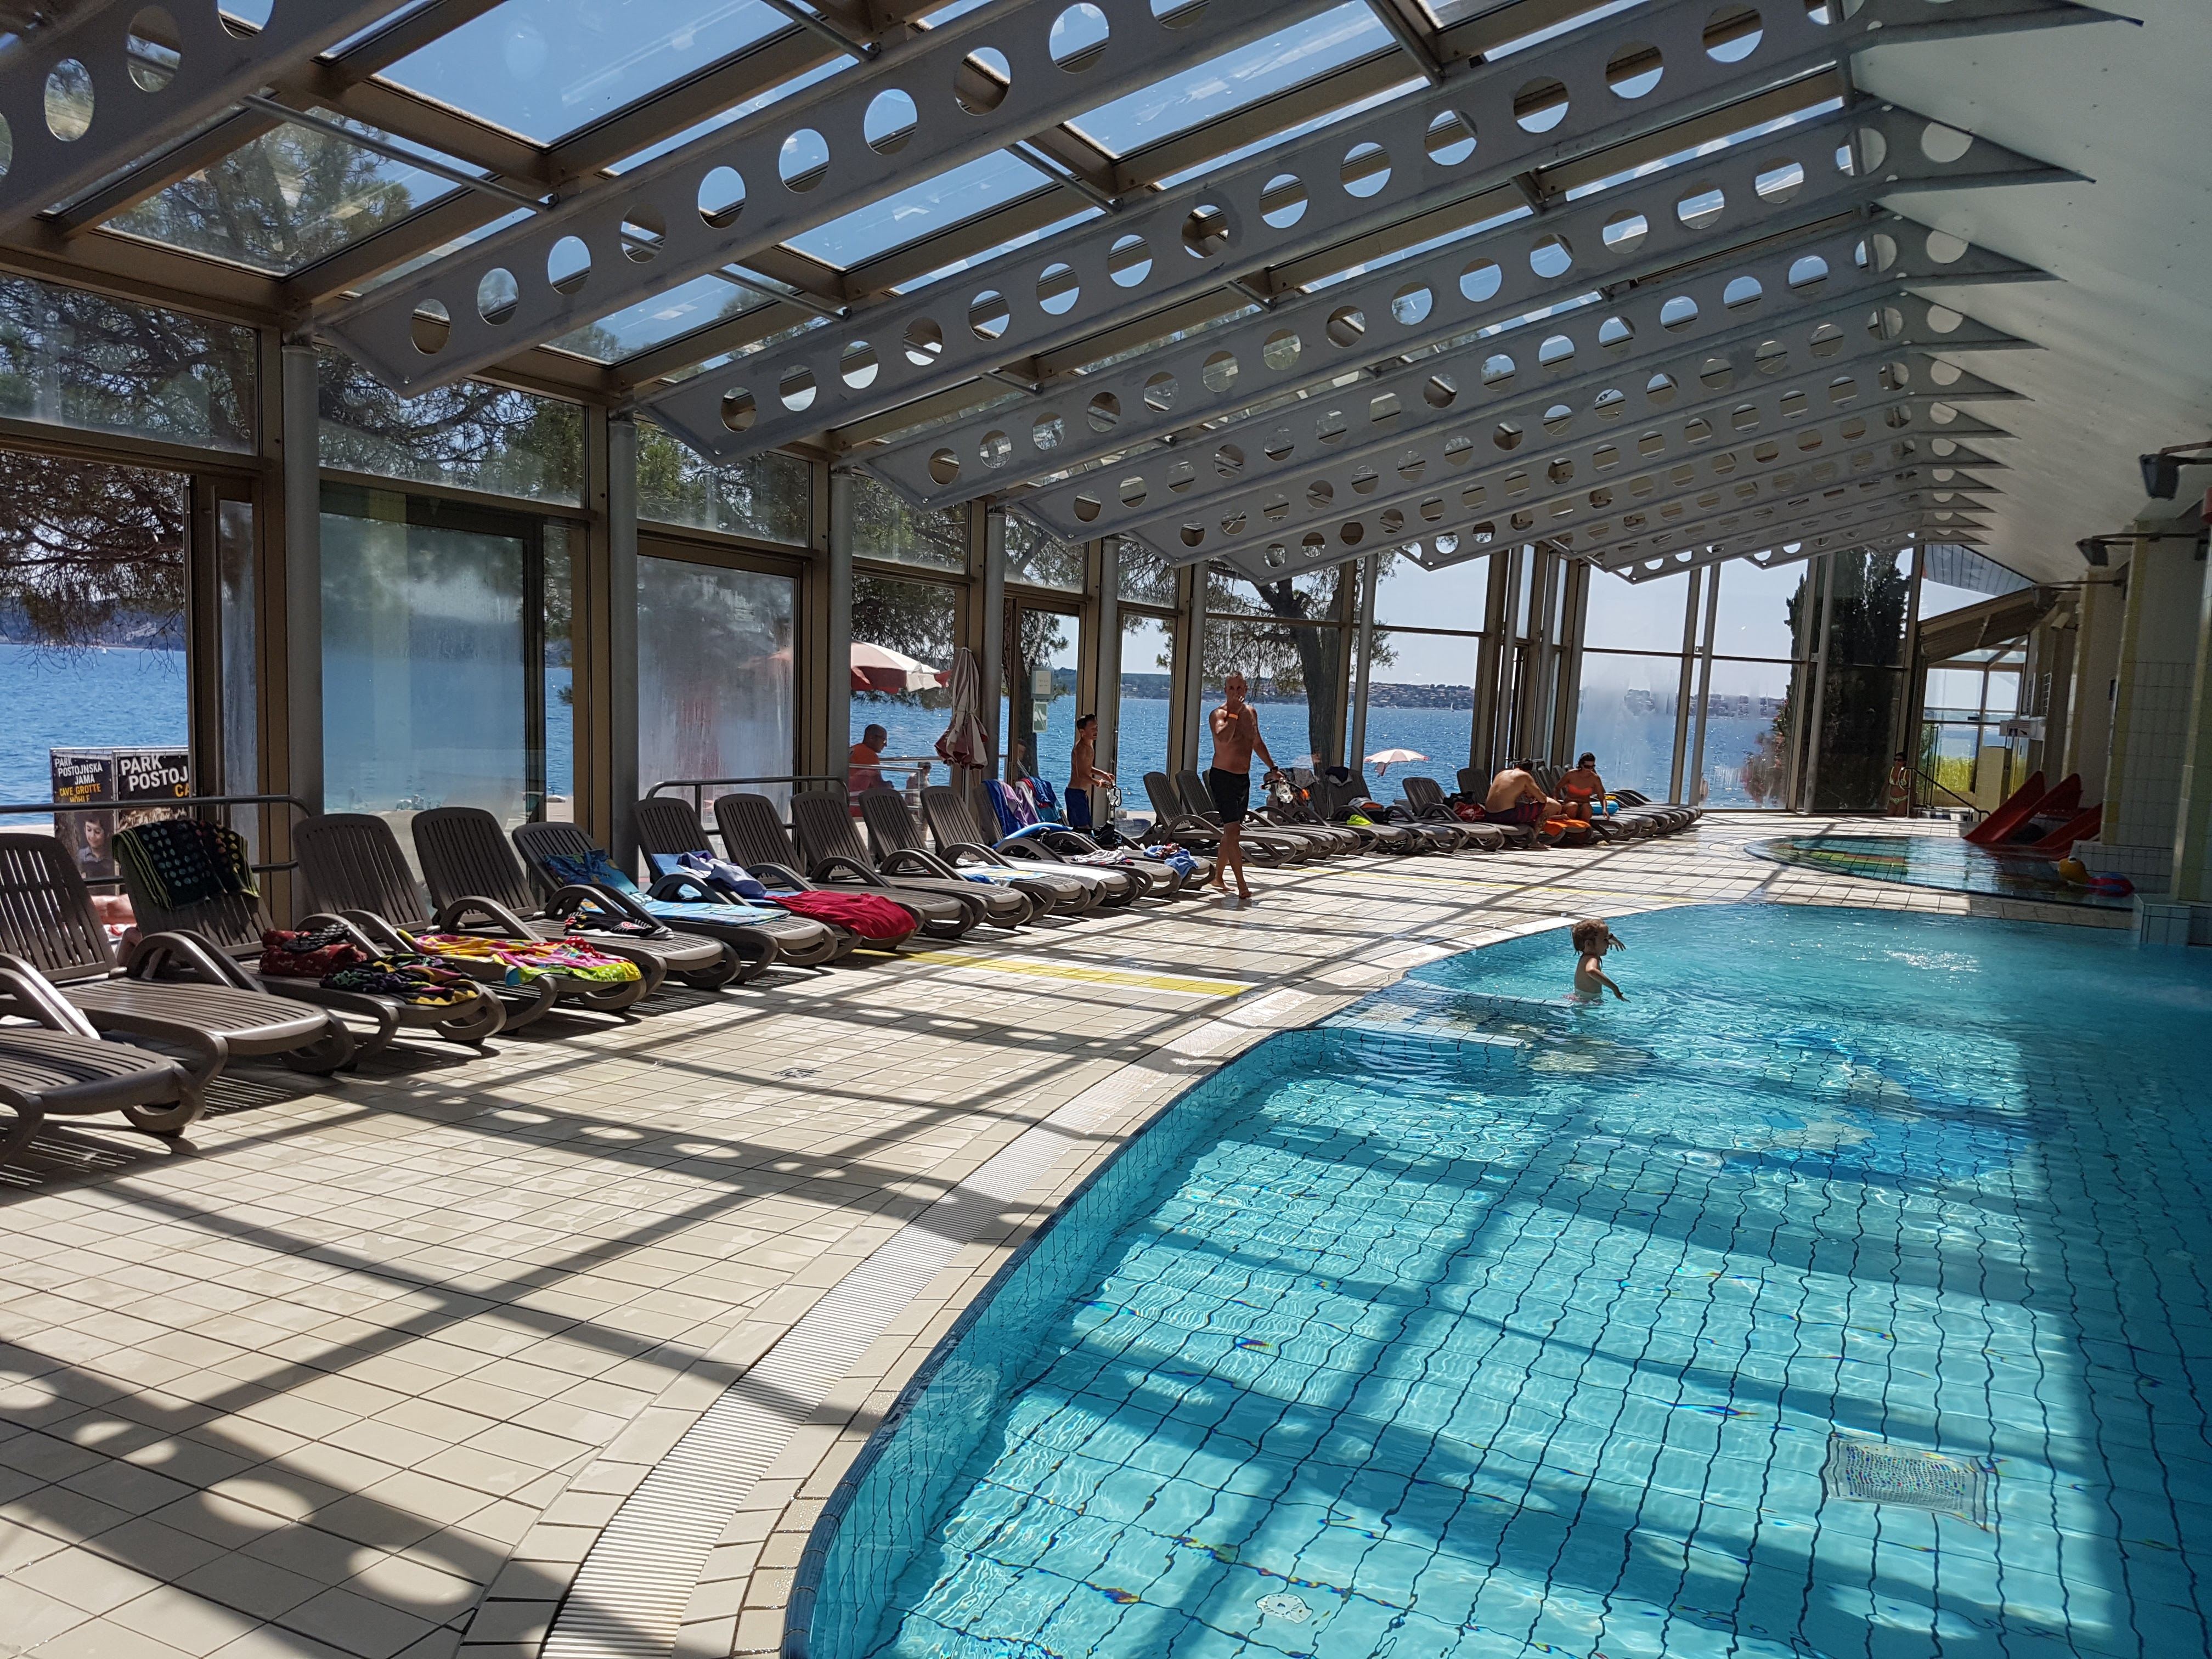 http://www.travelsys.sk/public/users/paxtour/images/fotogaleria_hotel/l_jul21_vilepark001.jpg